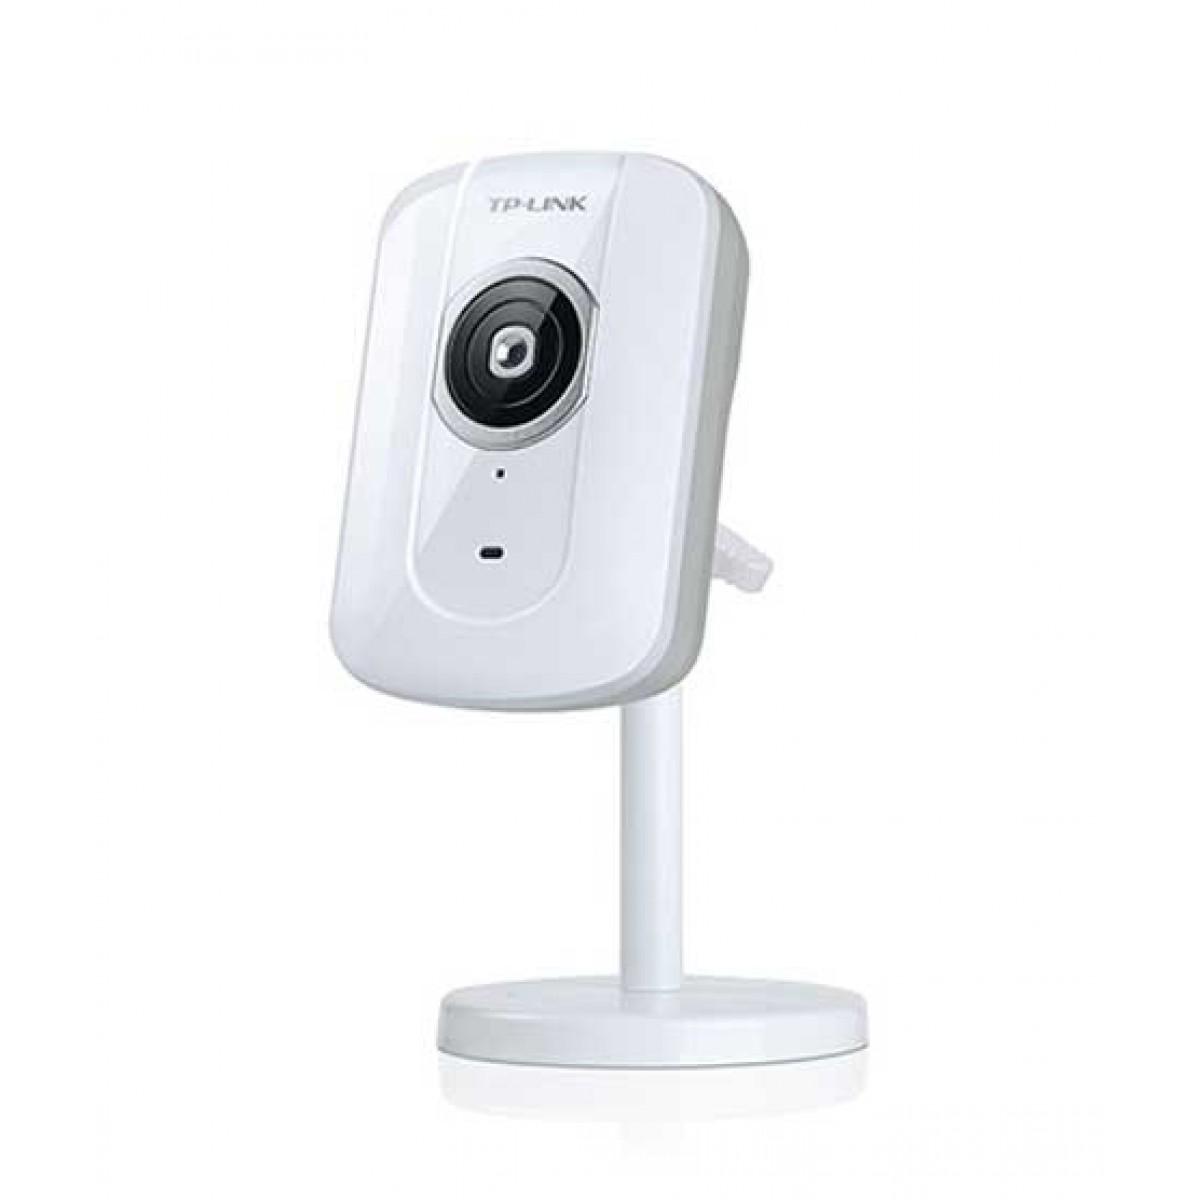 Tp link TL-SC2020N Wireless N Network Camera